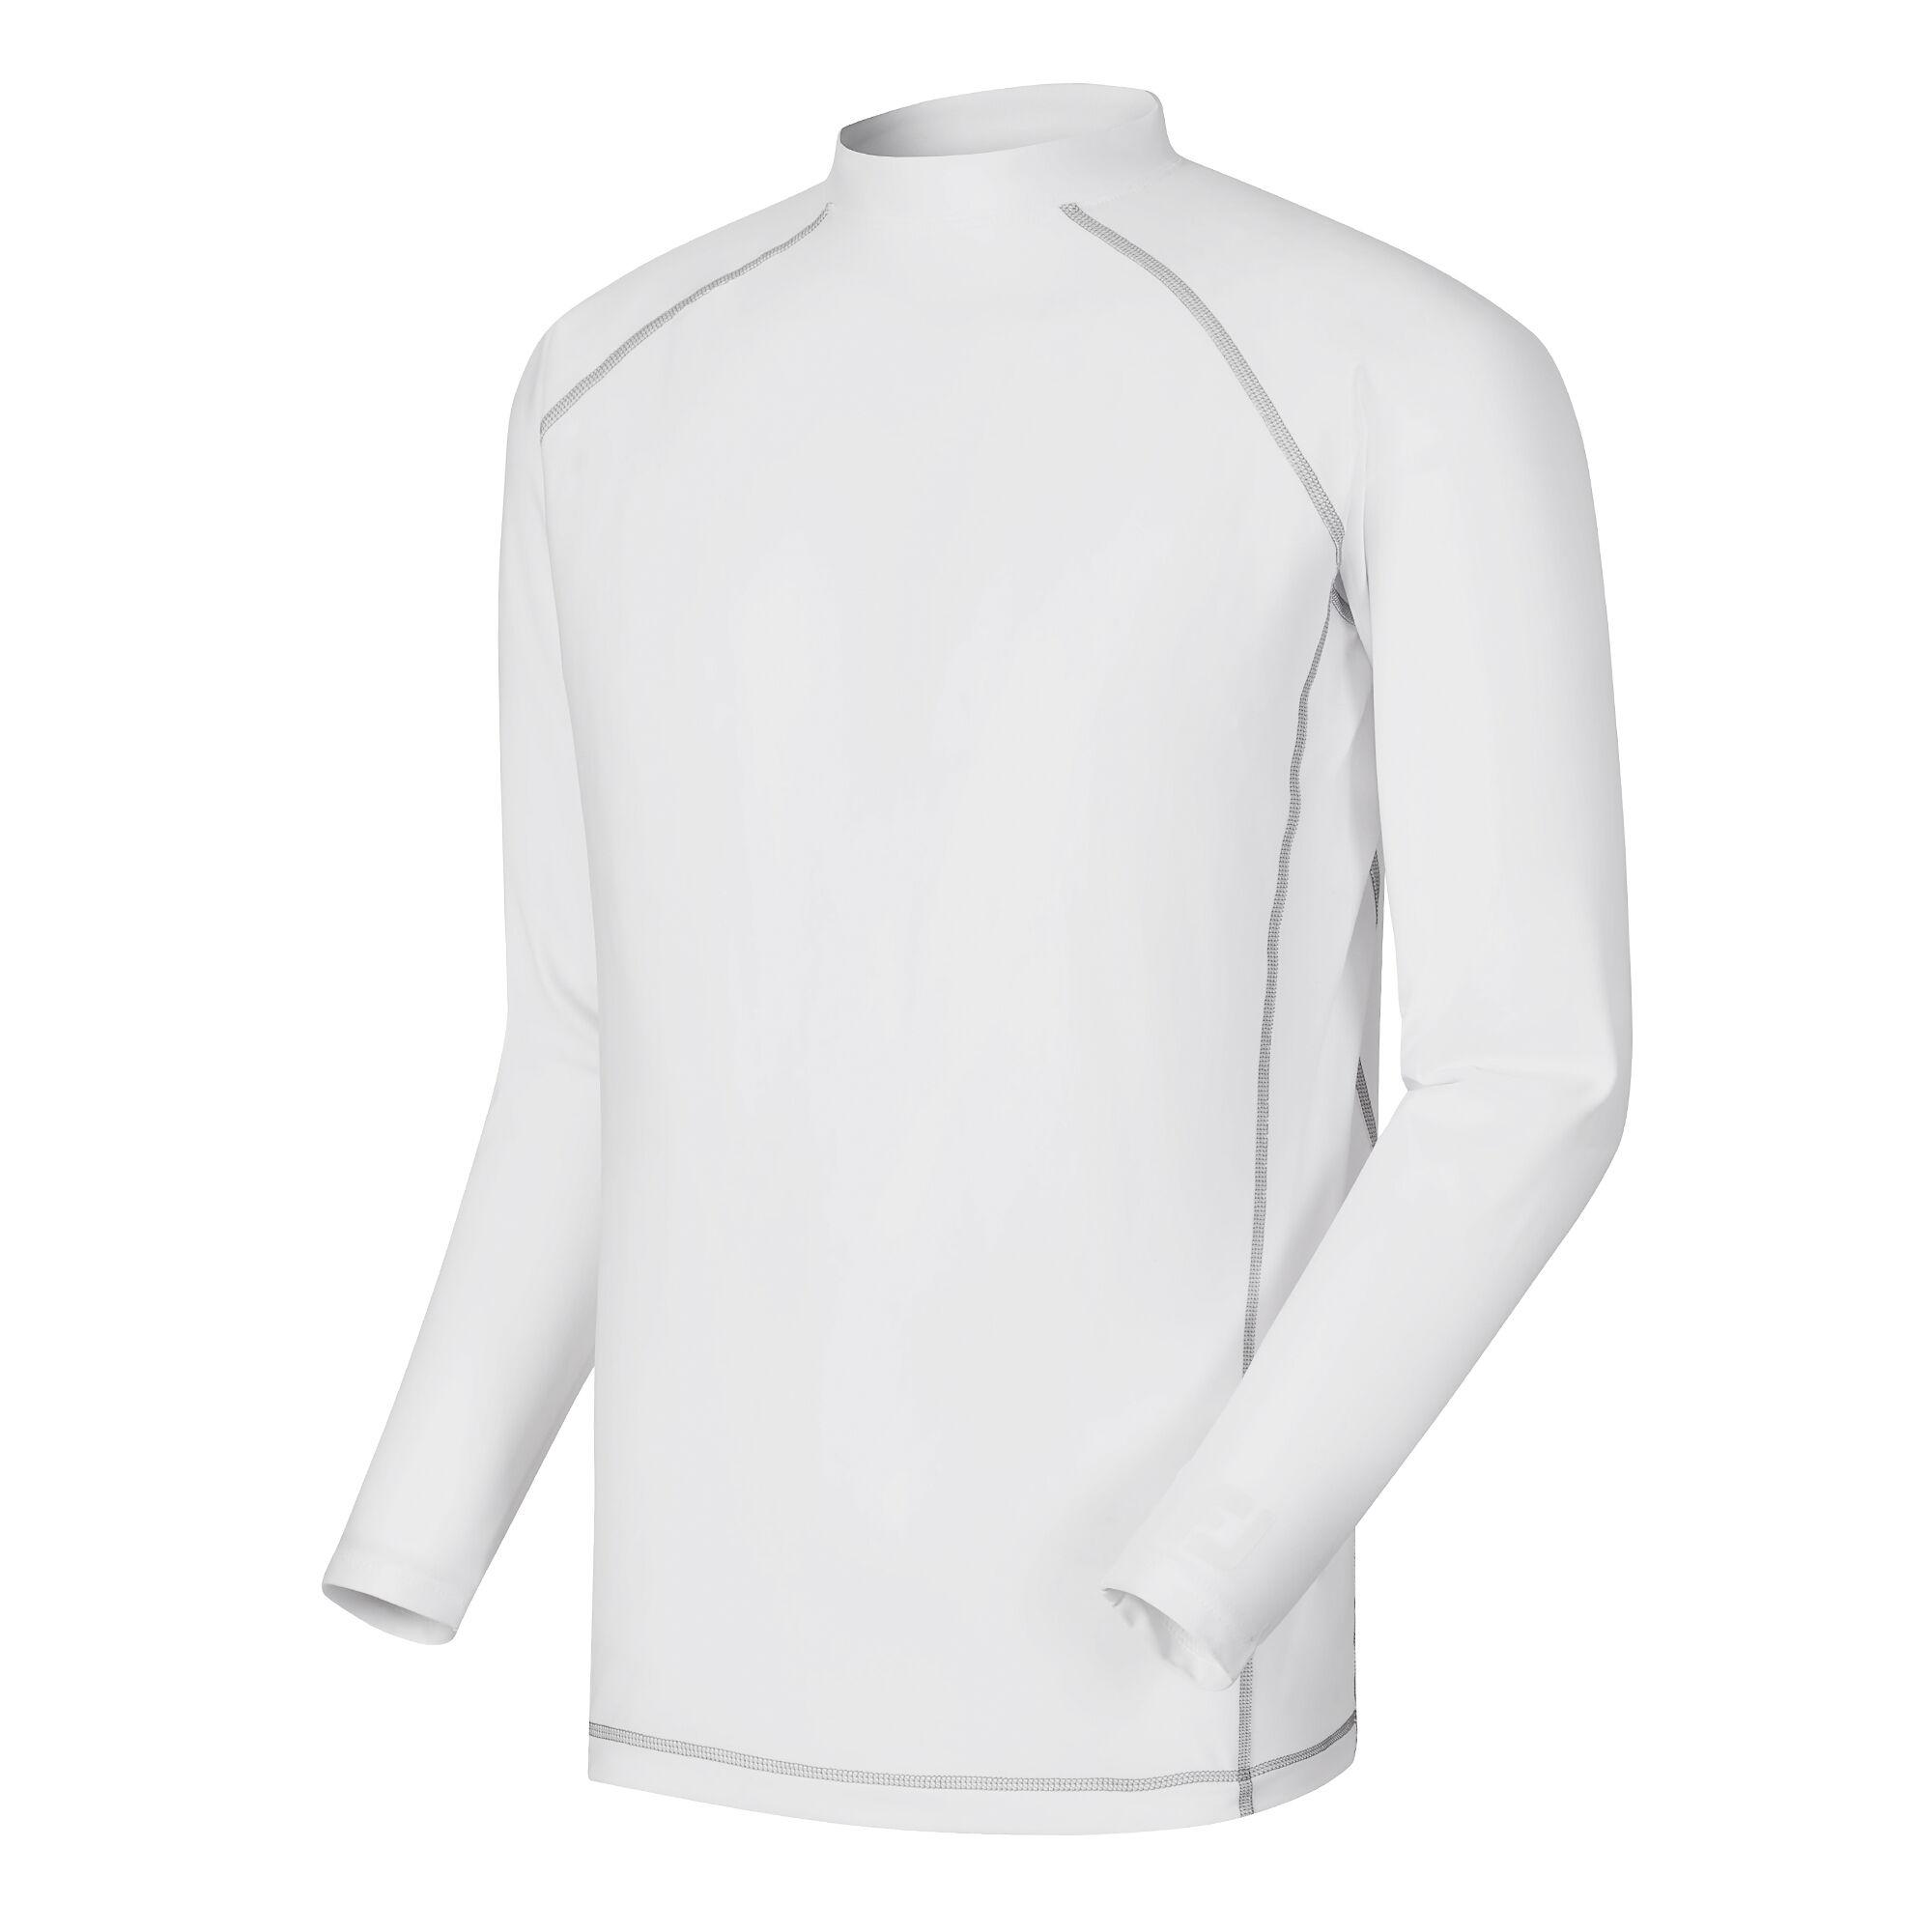 Thermal Base Layer Shirt · Thermal Base Layer Shirt ...